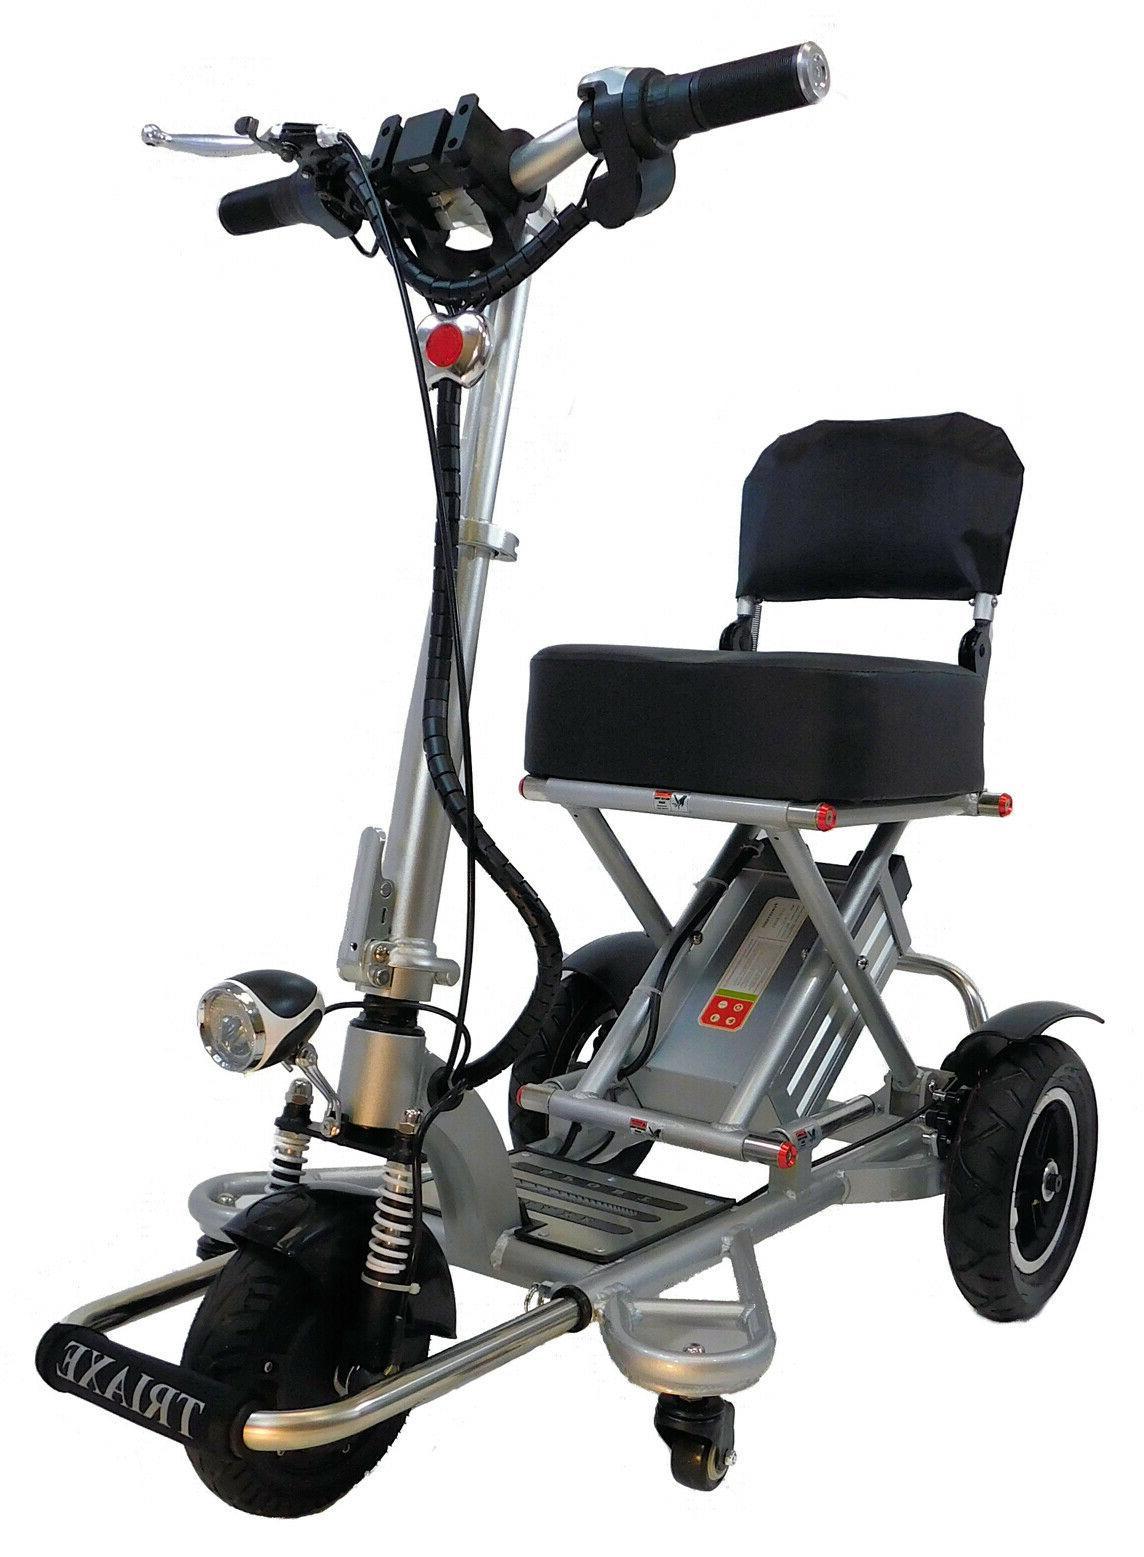 triaxe sport foldable portable 3 wheel electric